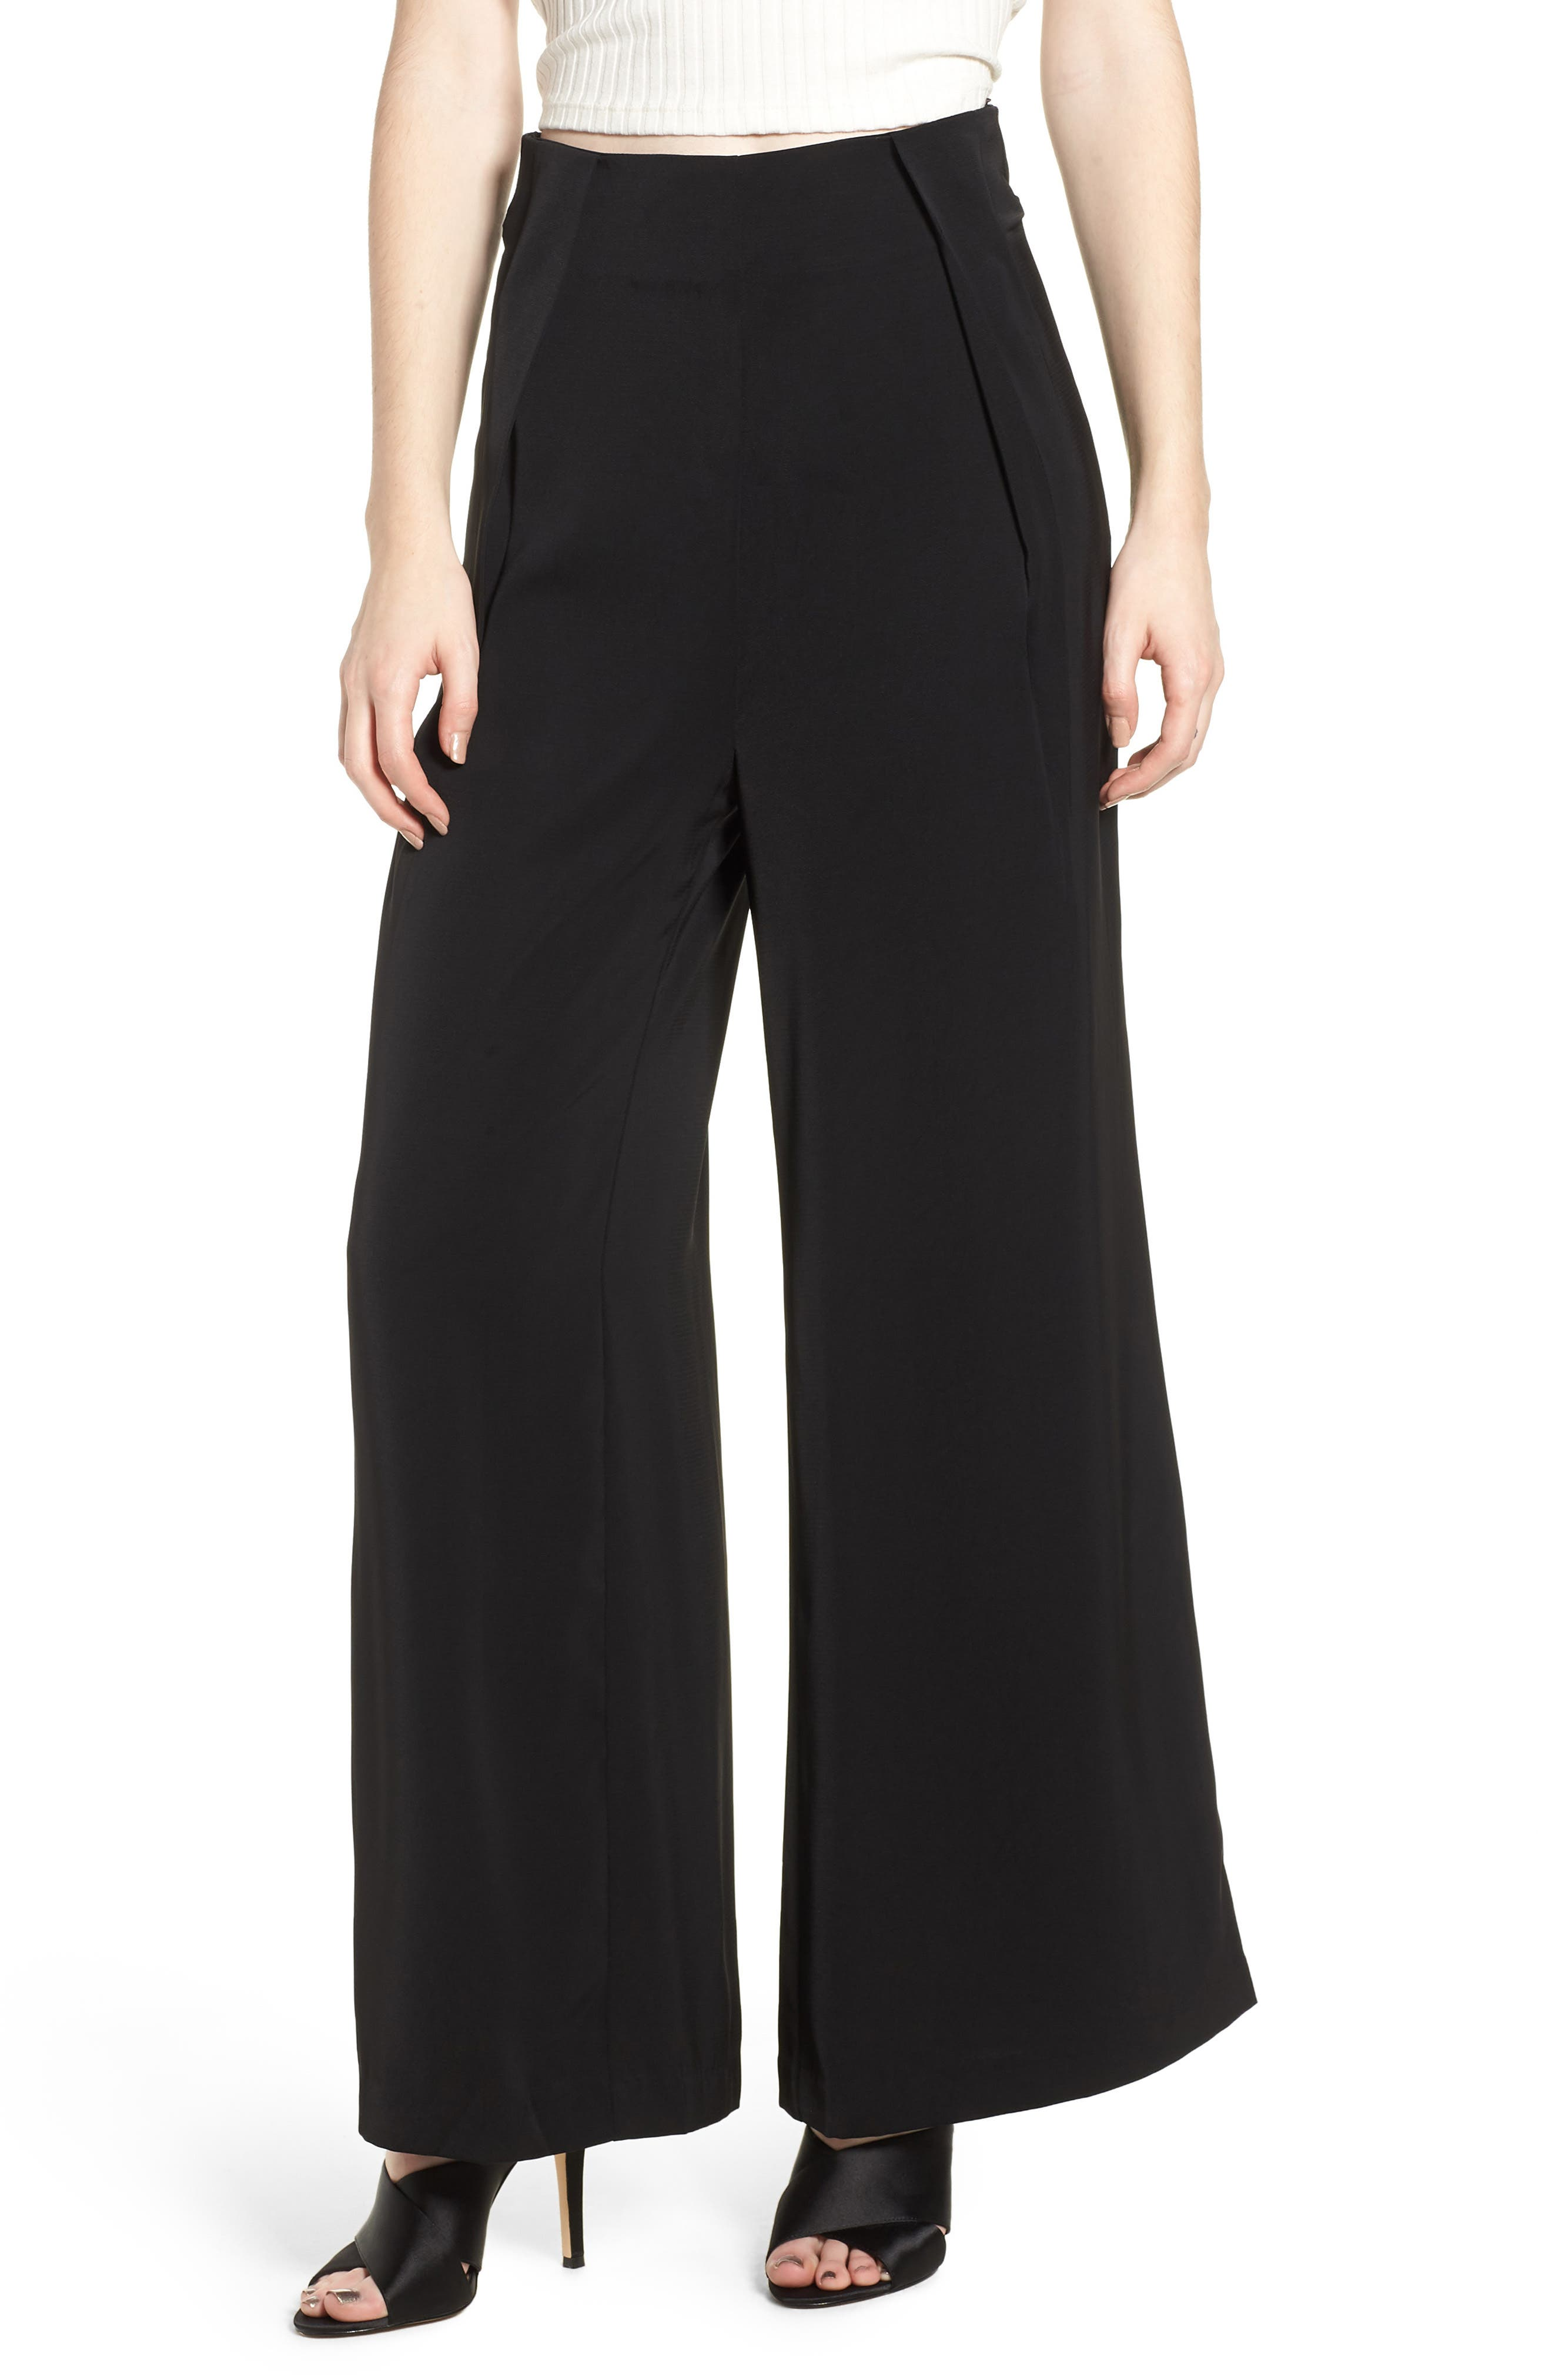 Madrigal Pants,                         Main,                         color, Black